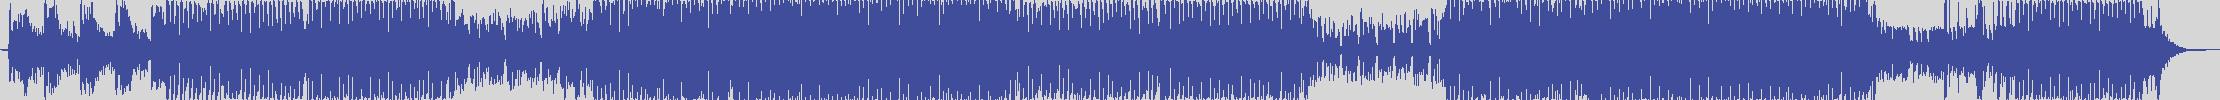 smilax_dig_records [Smilax_X448DIG] Dj Ruco, Spike - Sarà Perchè Ti Amo [Original Mix] audio wave form